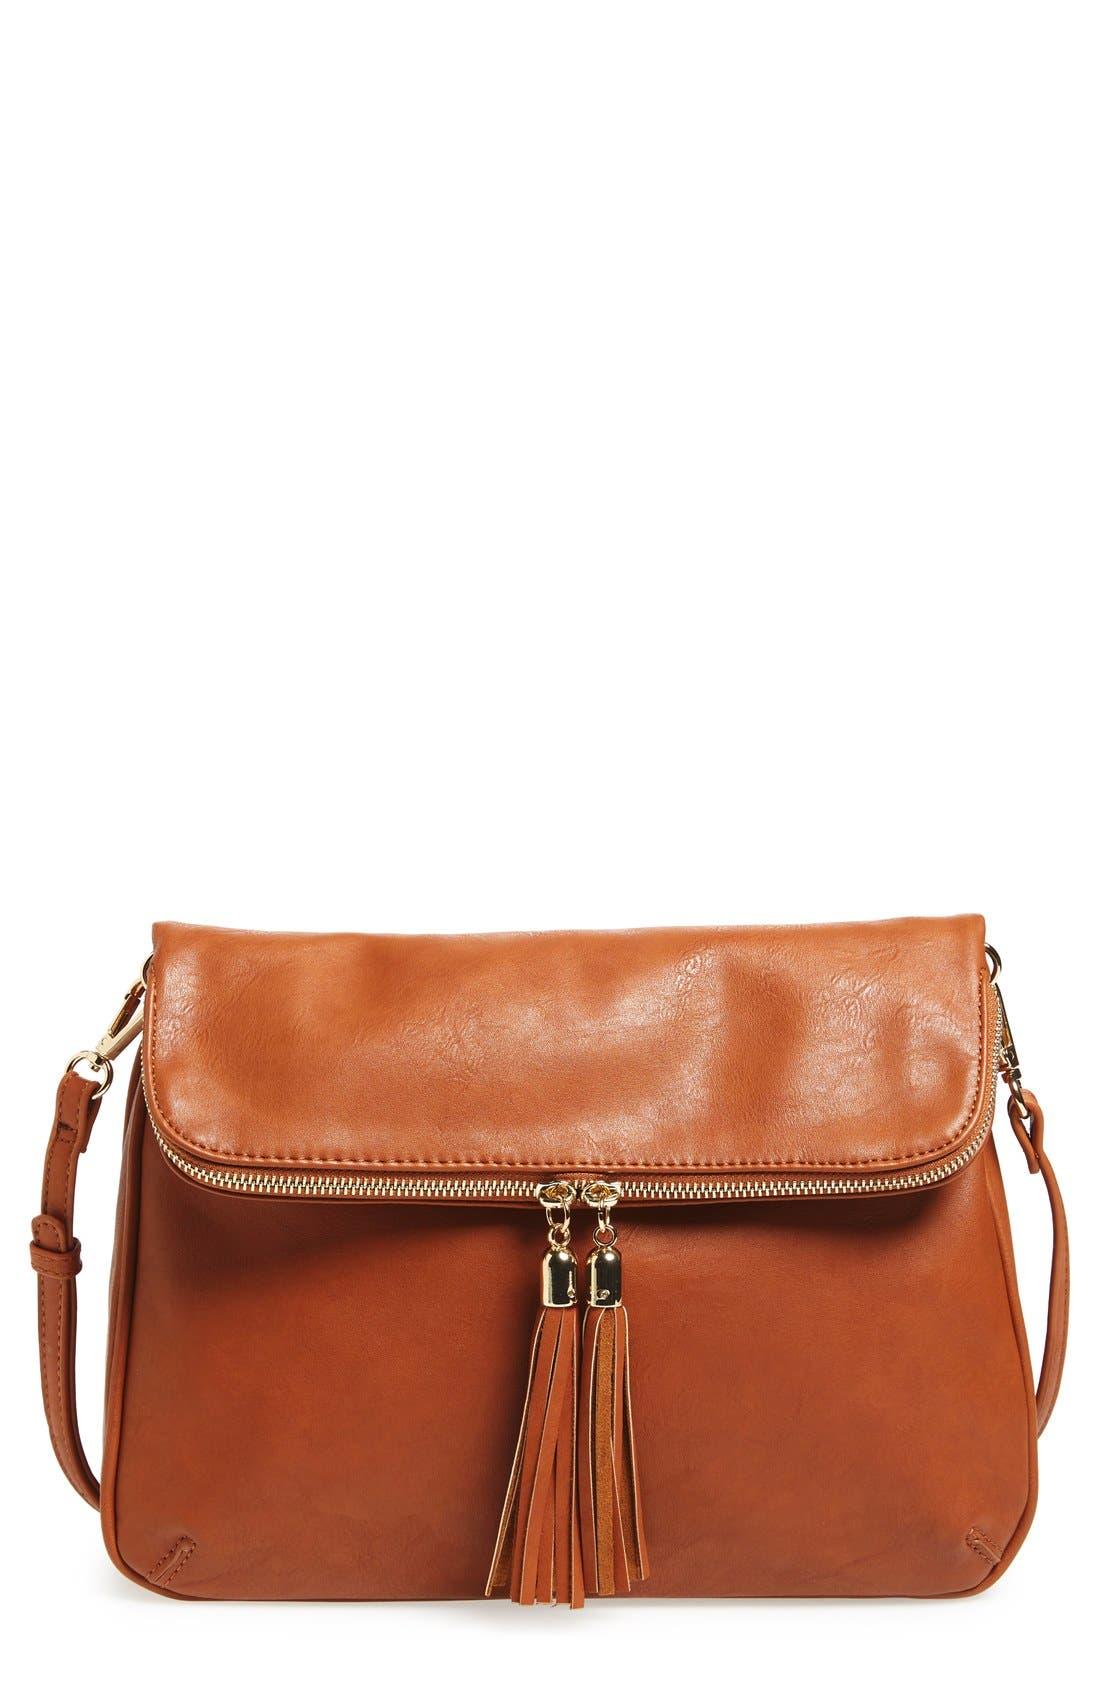 BP. Foldover Crossbody Bag